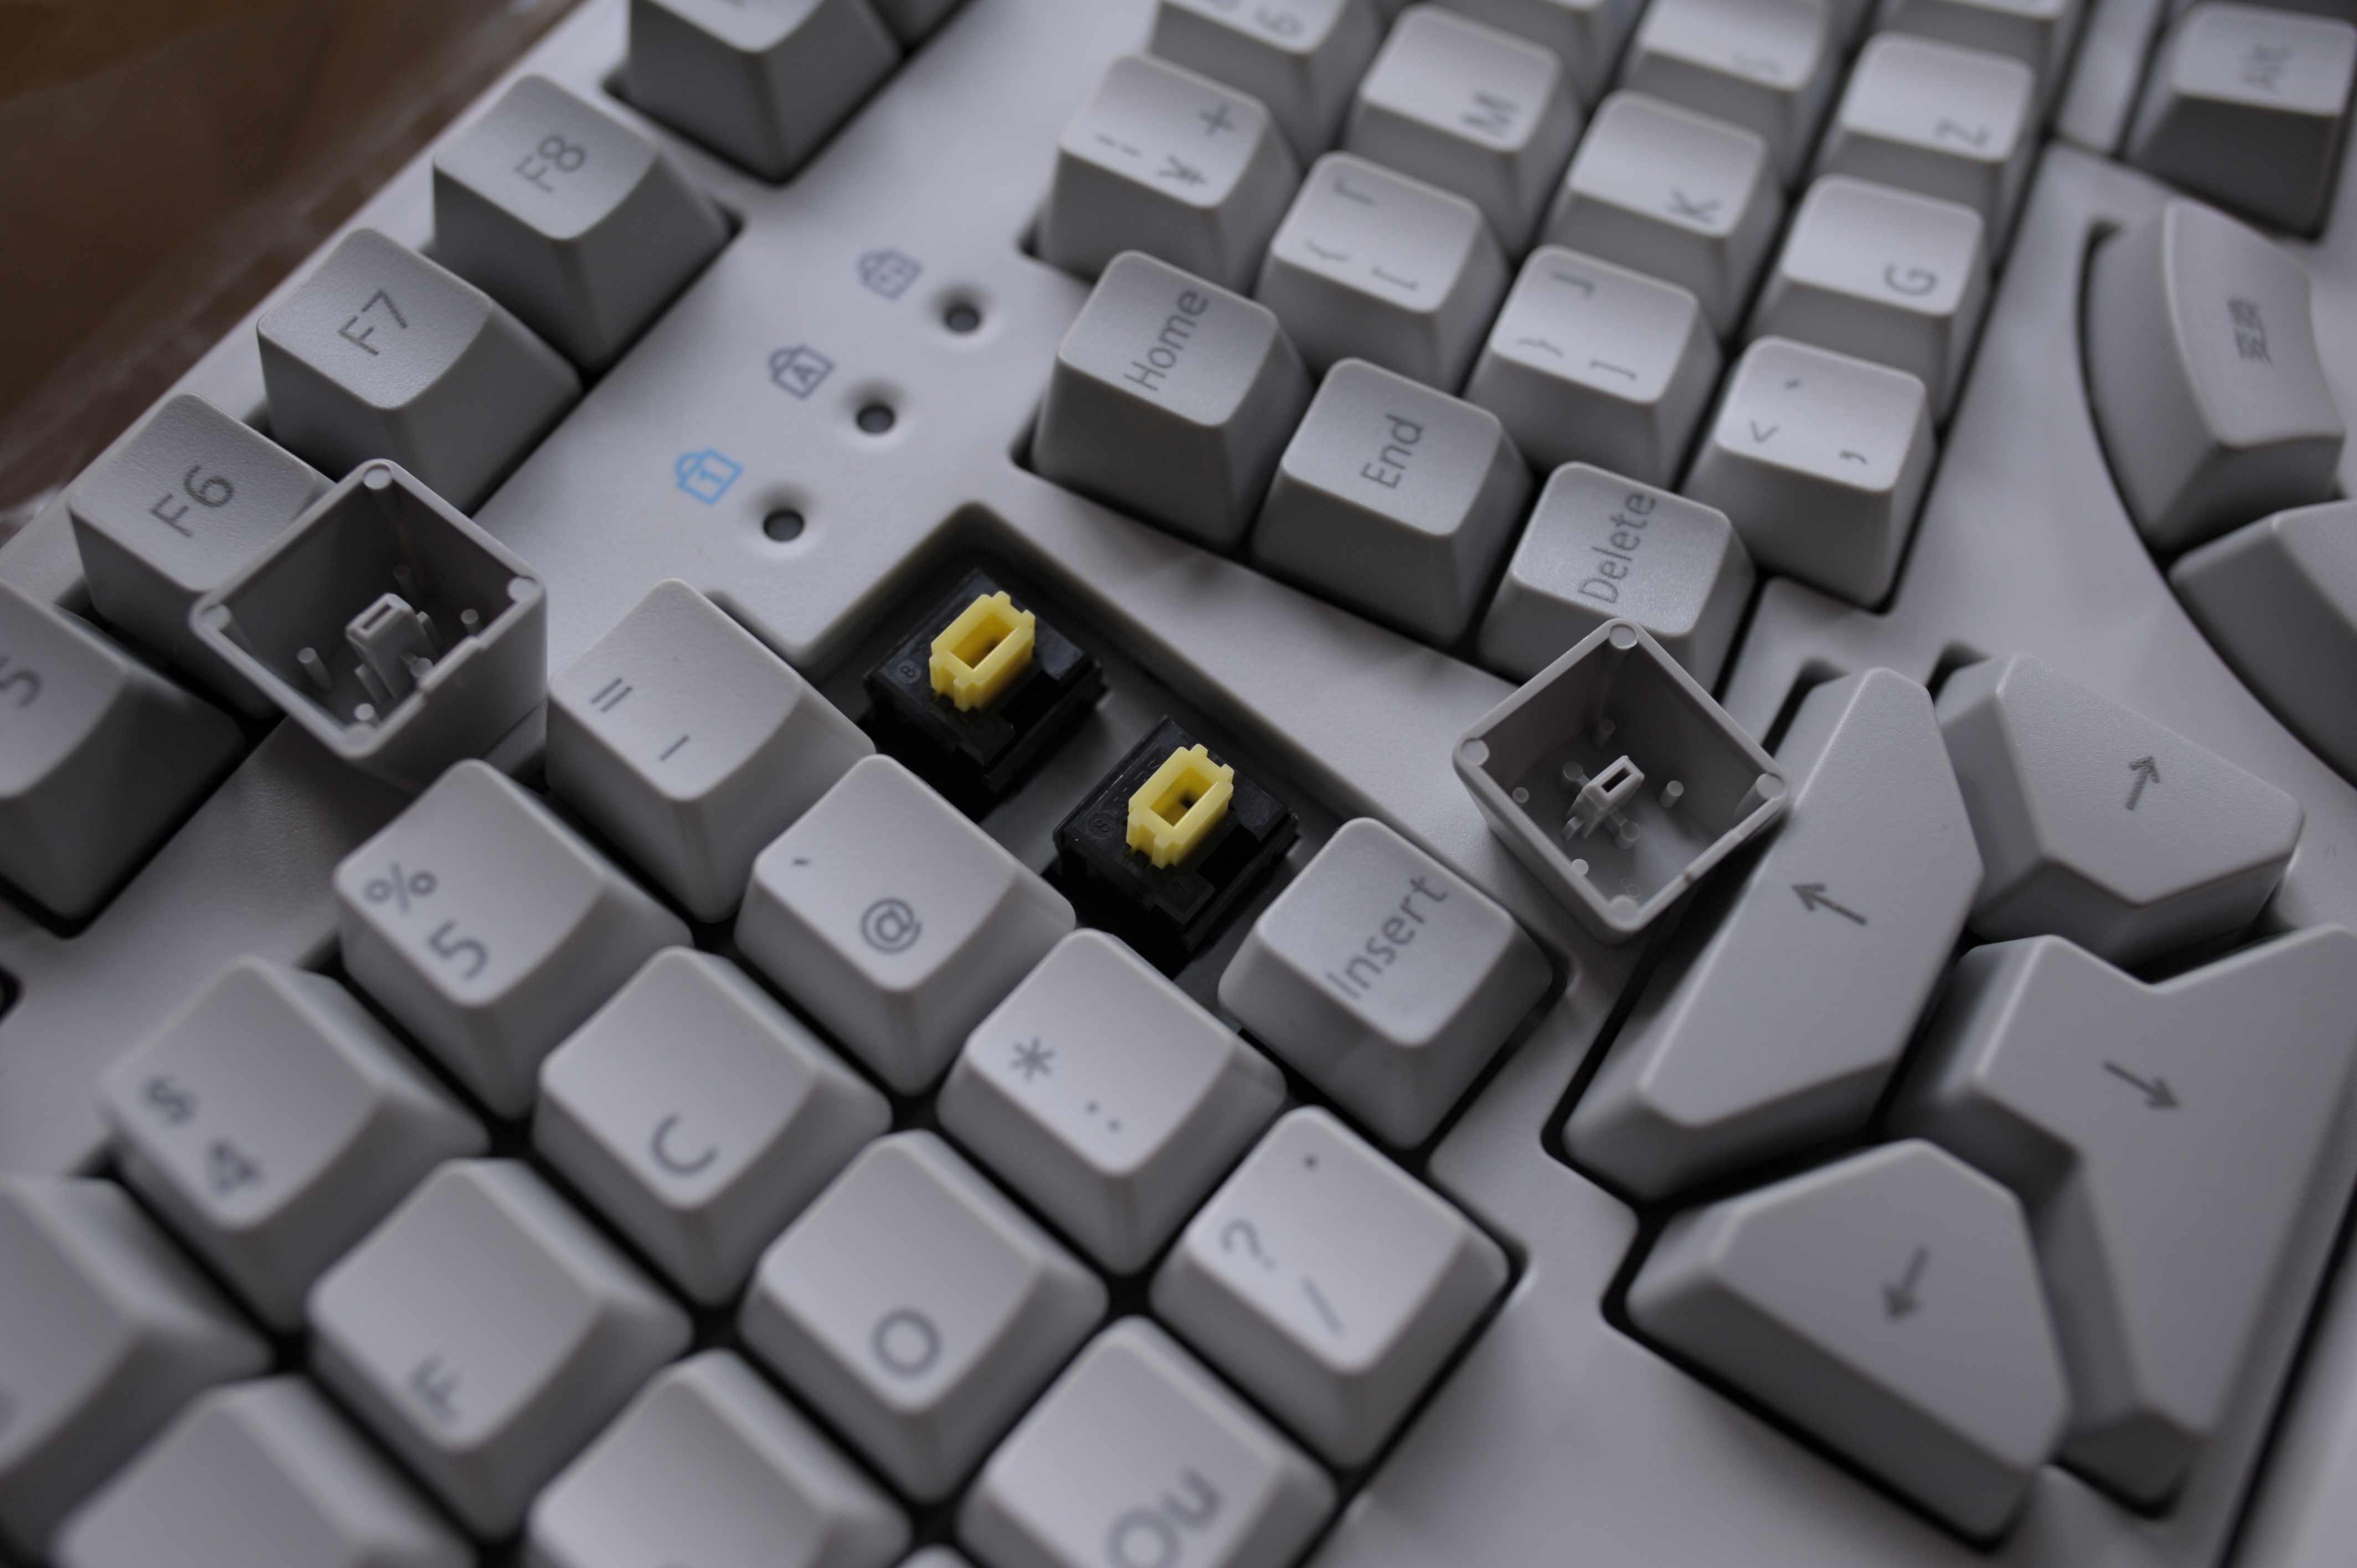 Nec 日本電気 M Type Keyboard